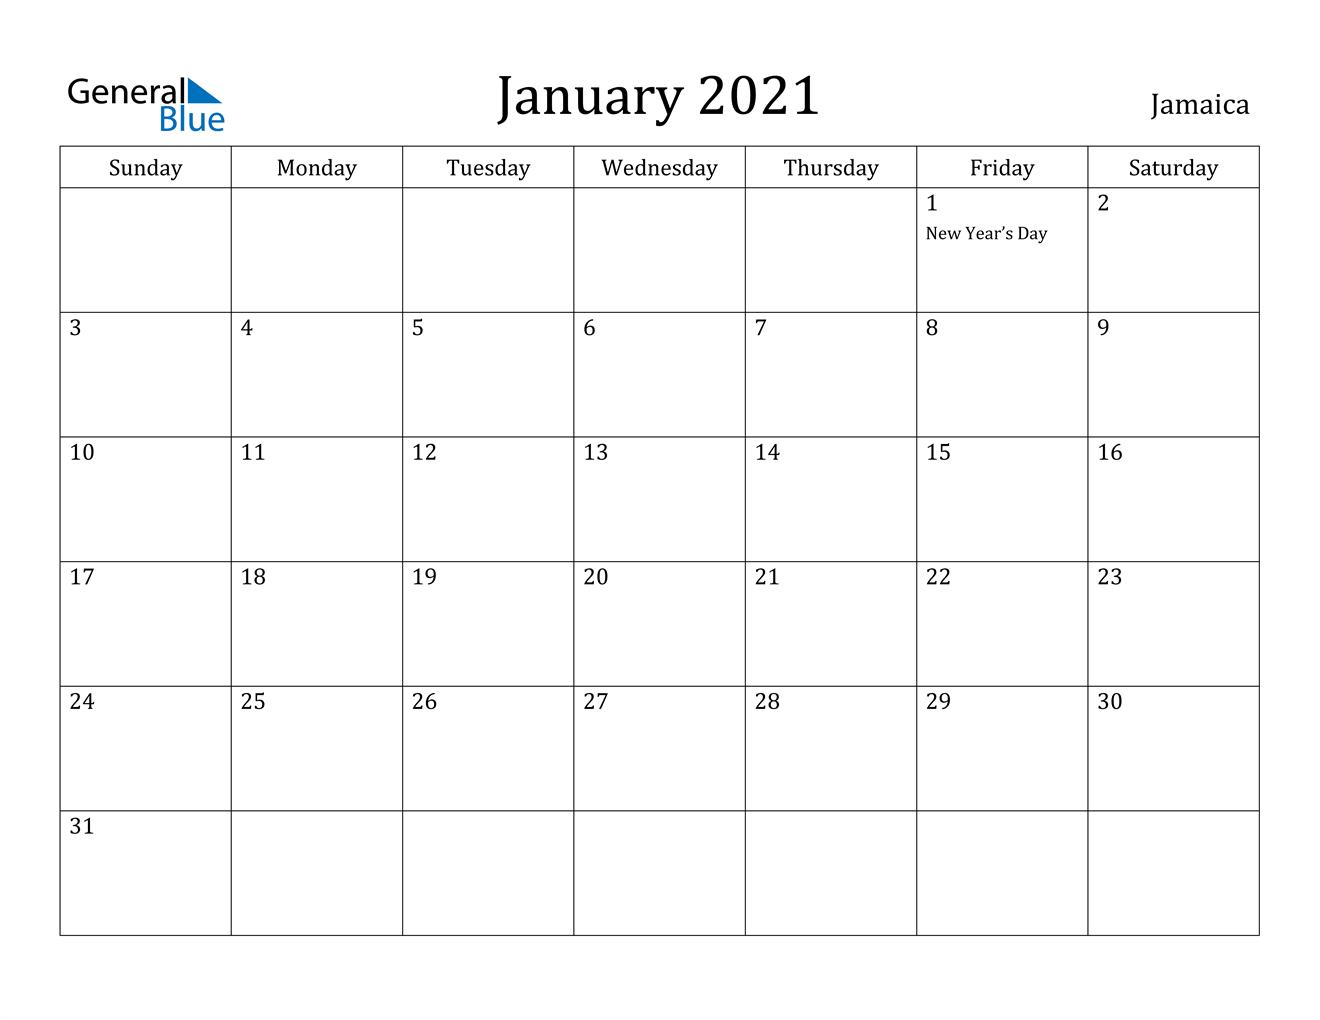 January 2021 Calendar - Jamaica